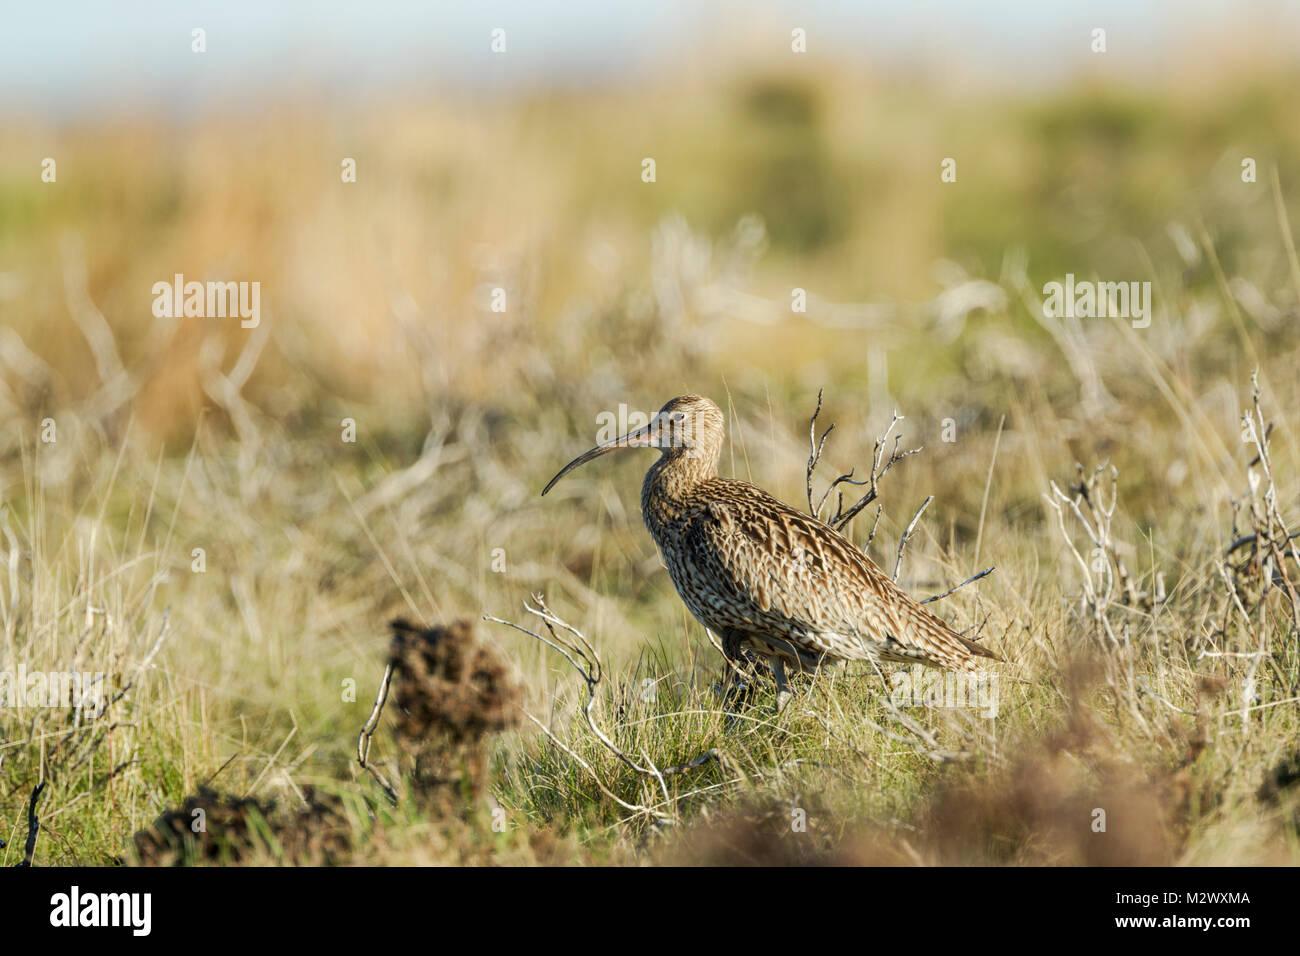 Eurasian Curlew, Latin name Numenius arquata, standing among rough moorland terrain in the North York Moors National - Stock Image